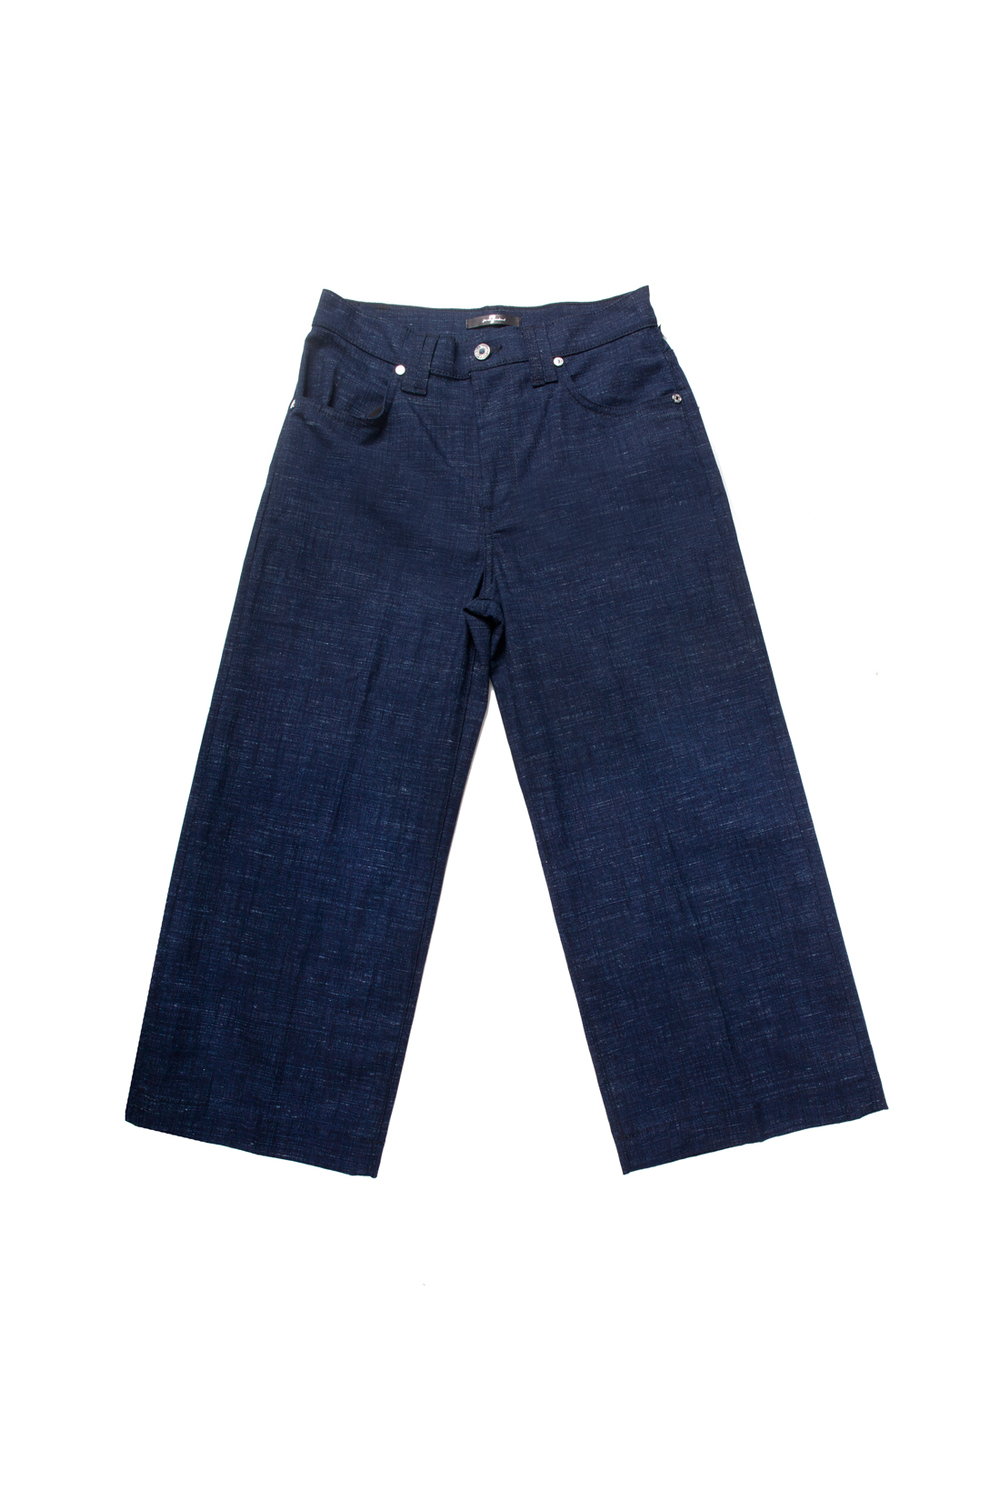 02-spring-denim-trends-culottes-01.jpg